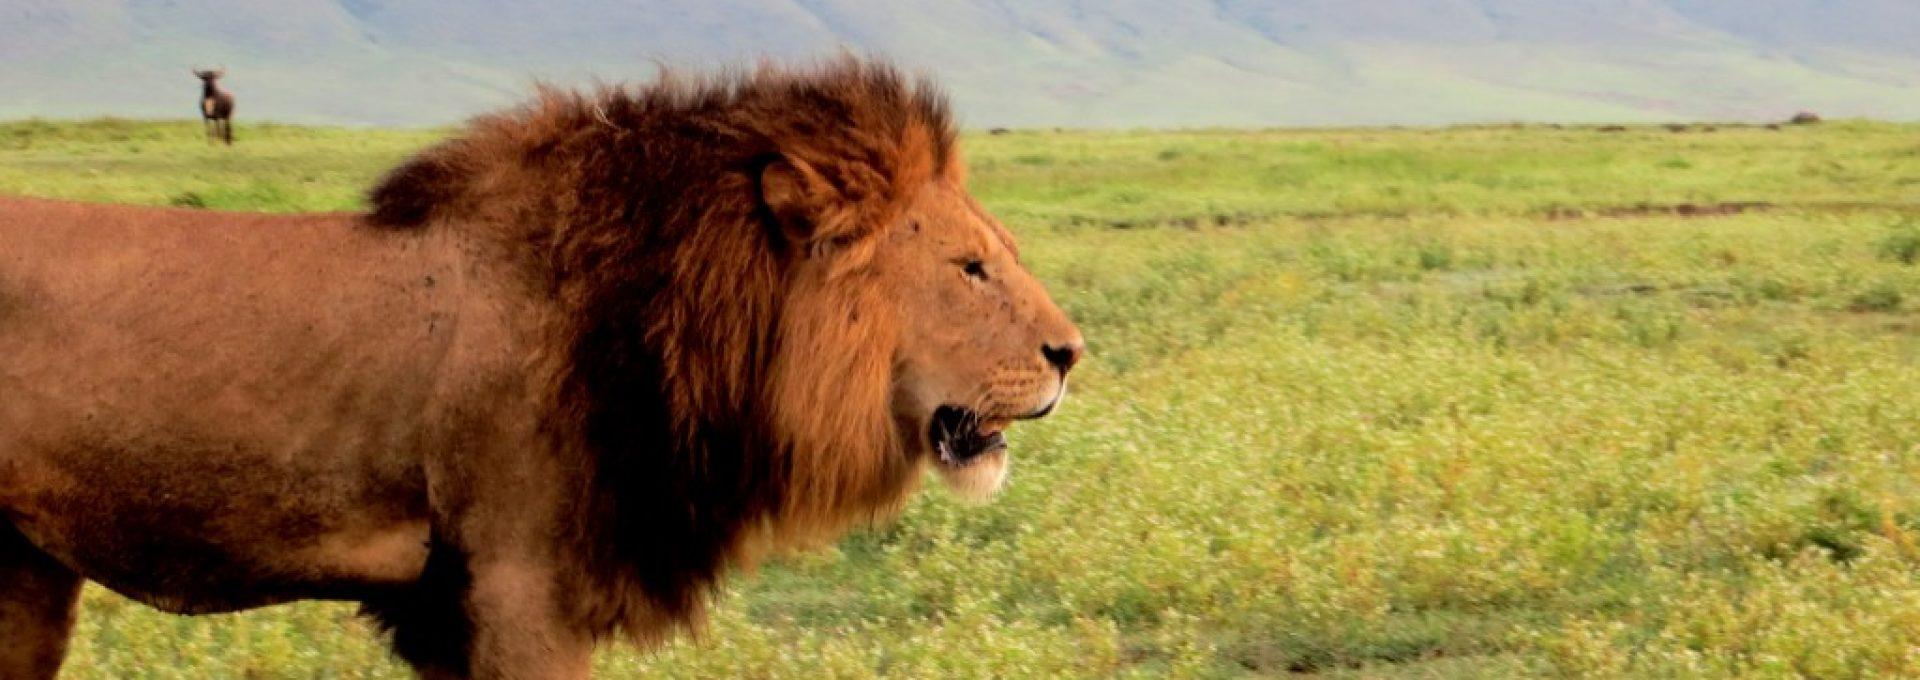 Zazu Tanzania Safaris